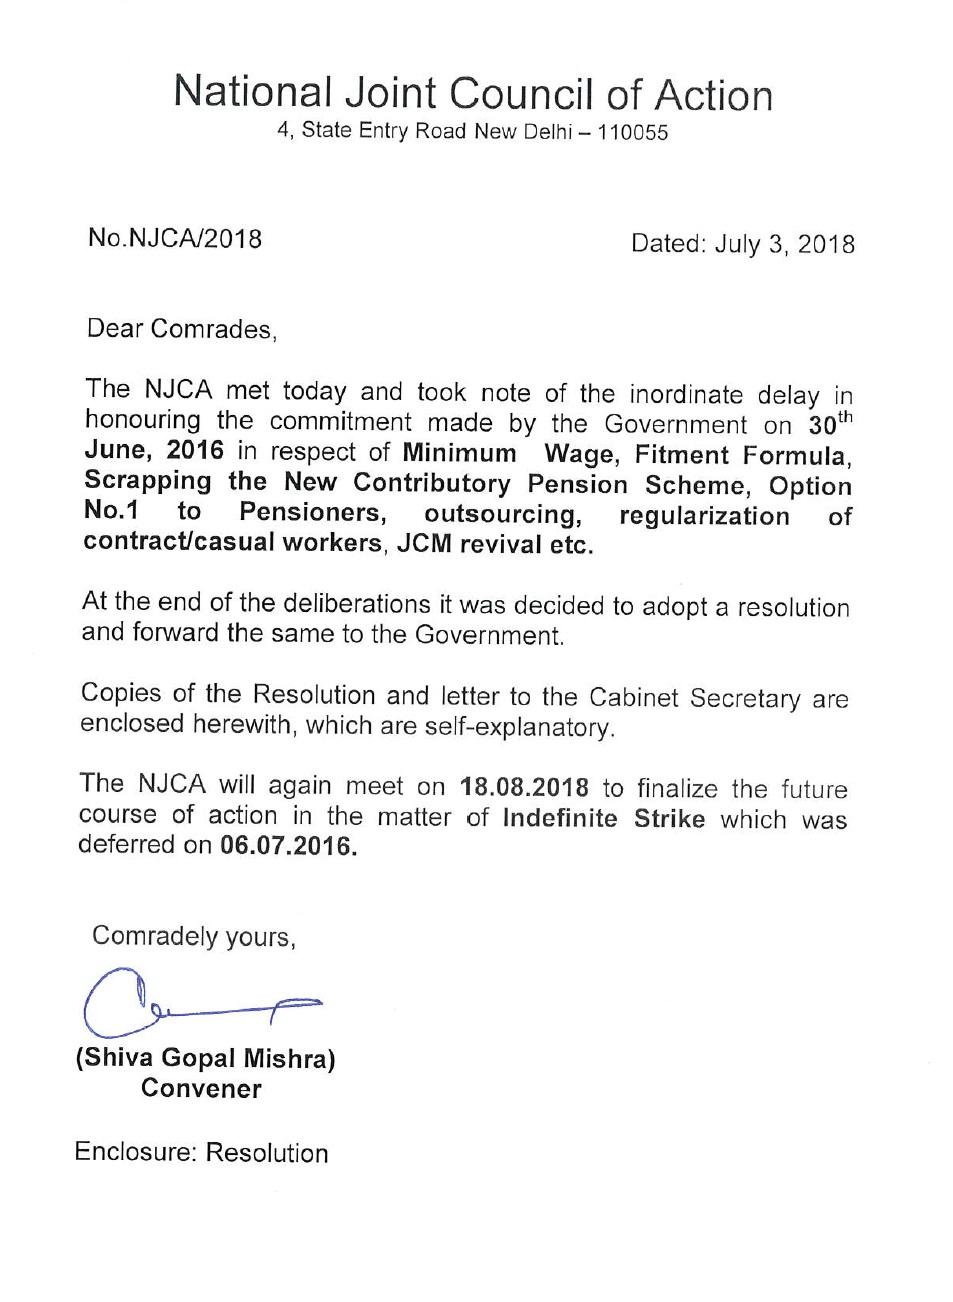 NJCA letter dated 03-07-2018